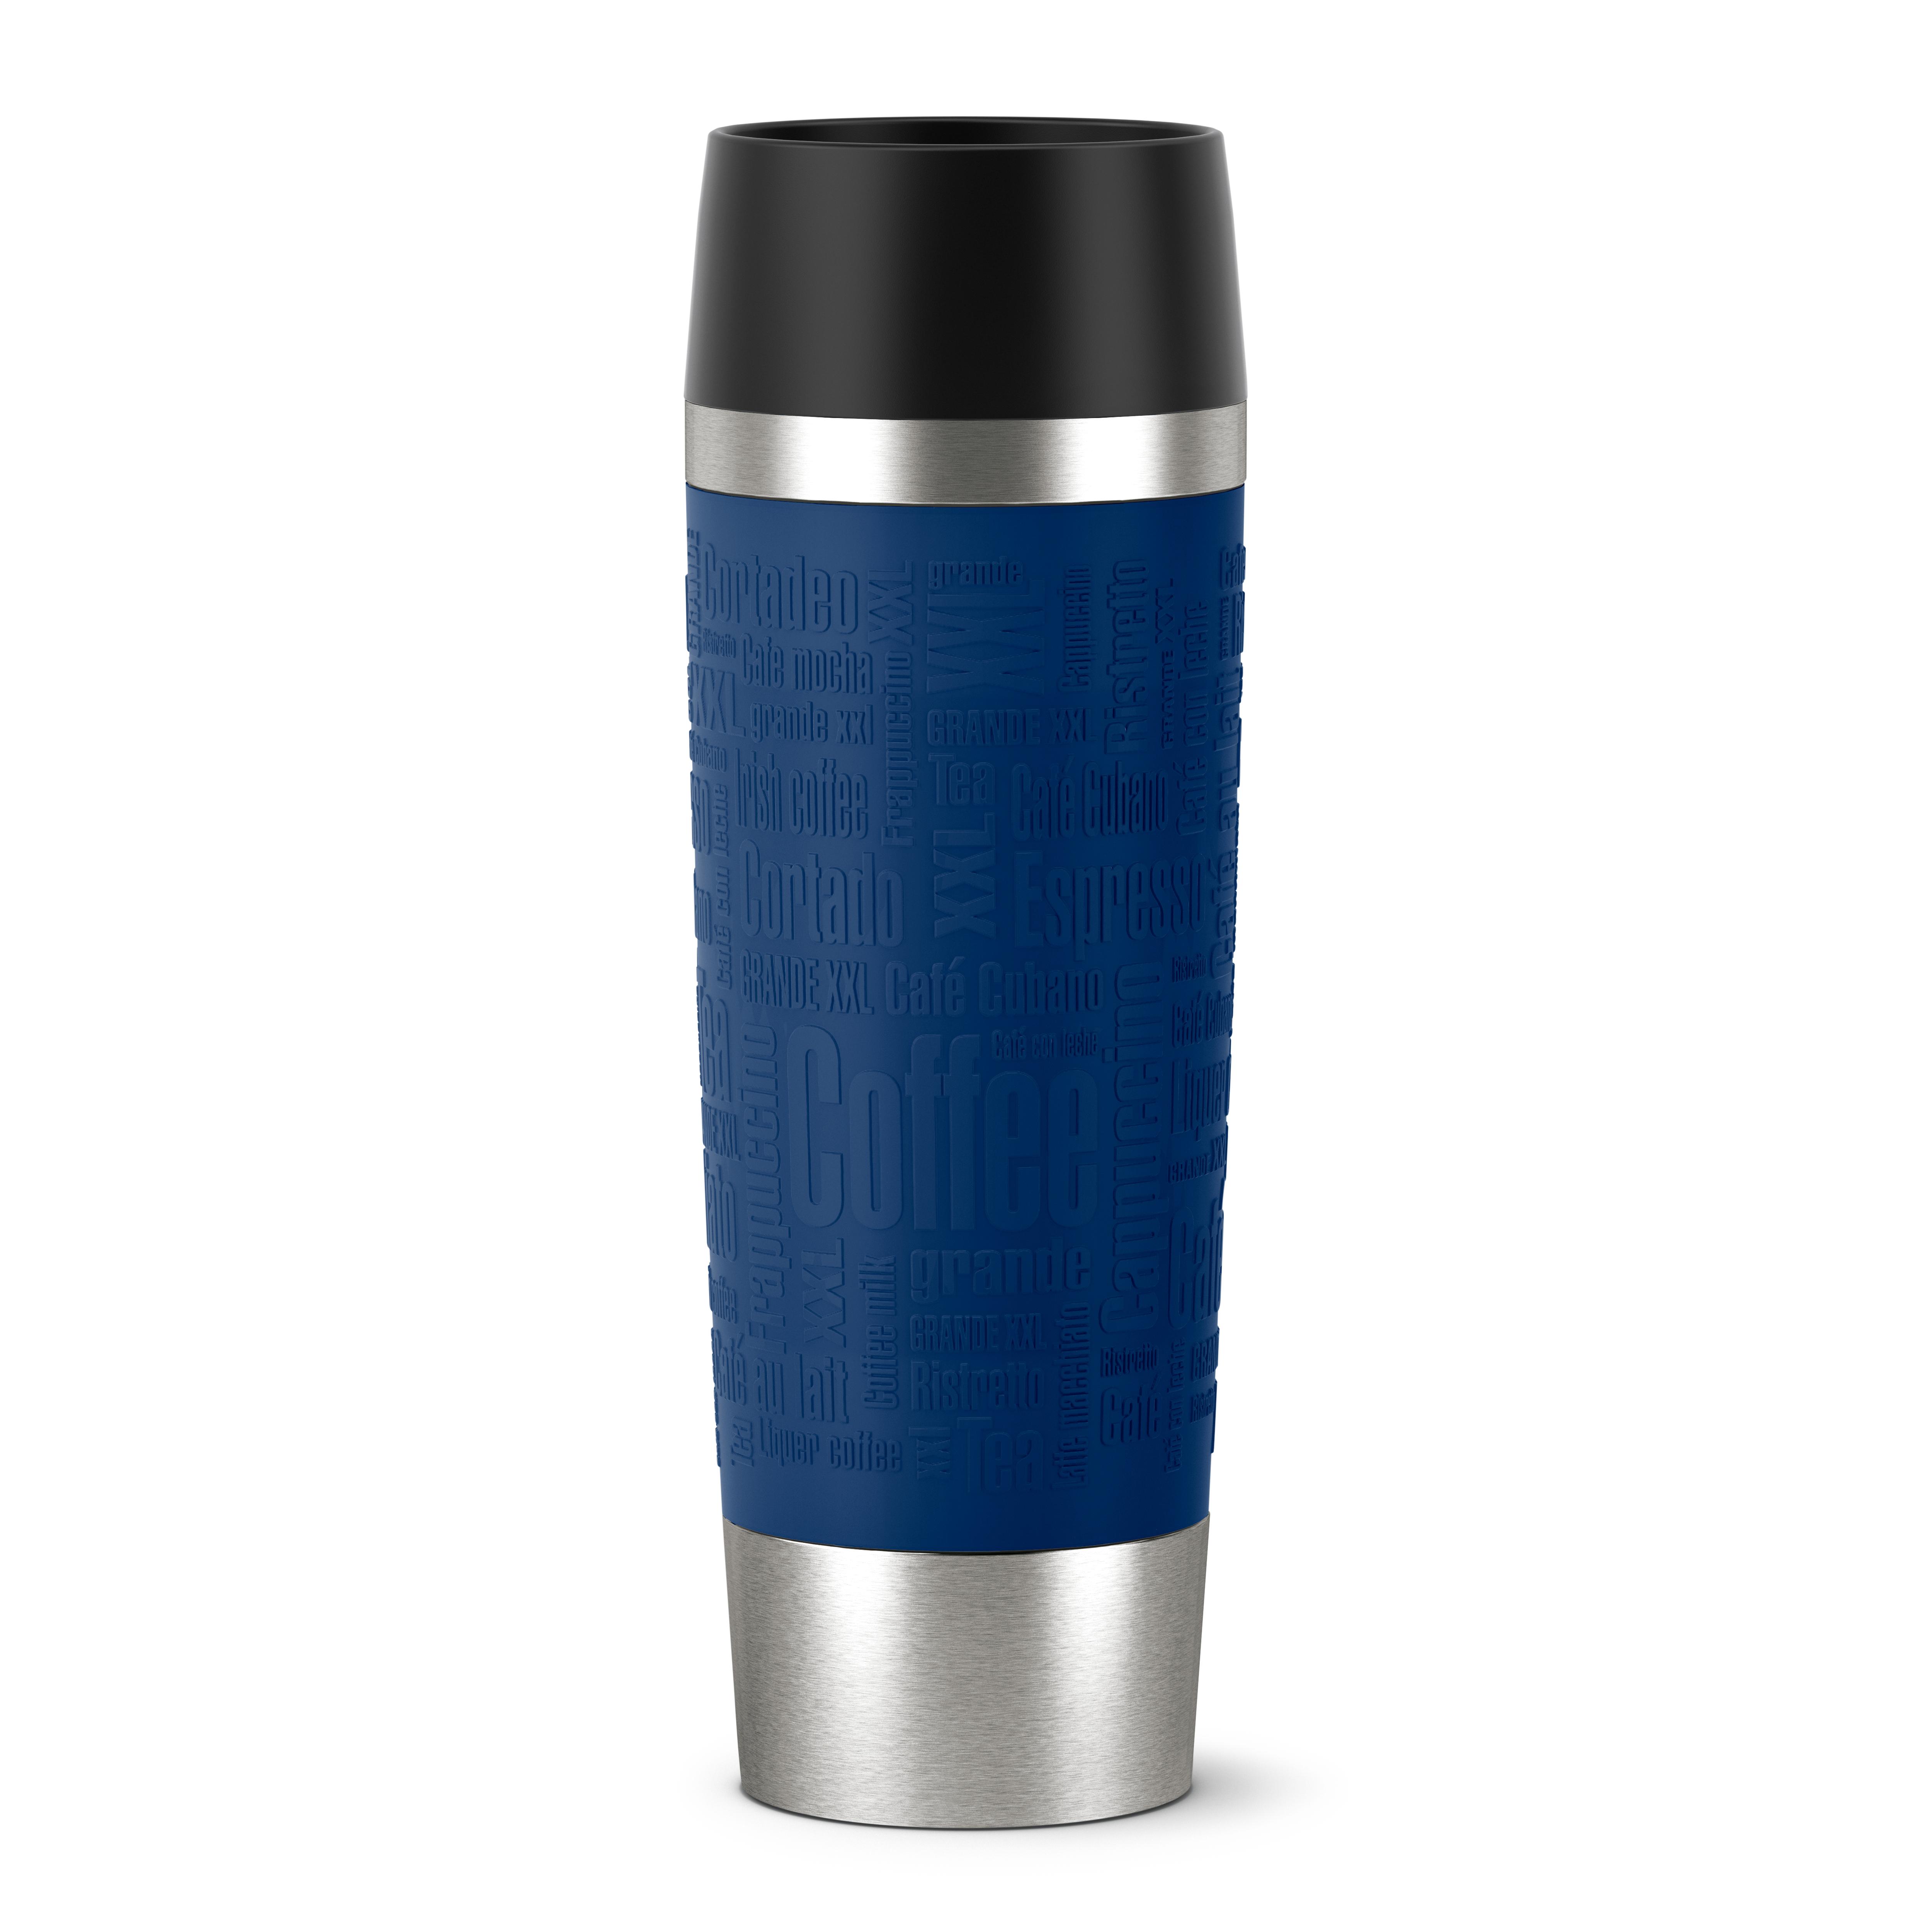 EMSA 515618 TRAVEL MUG GRANDE Isolierbecher 0,5L Blau